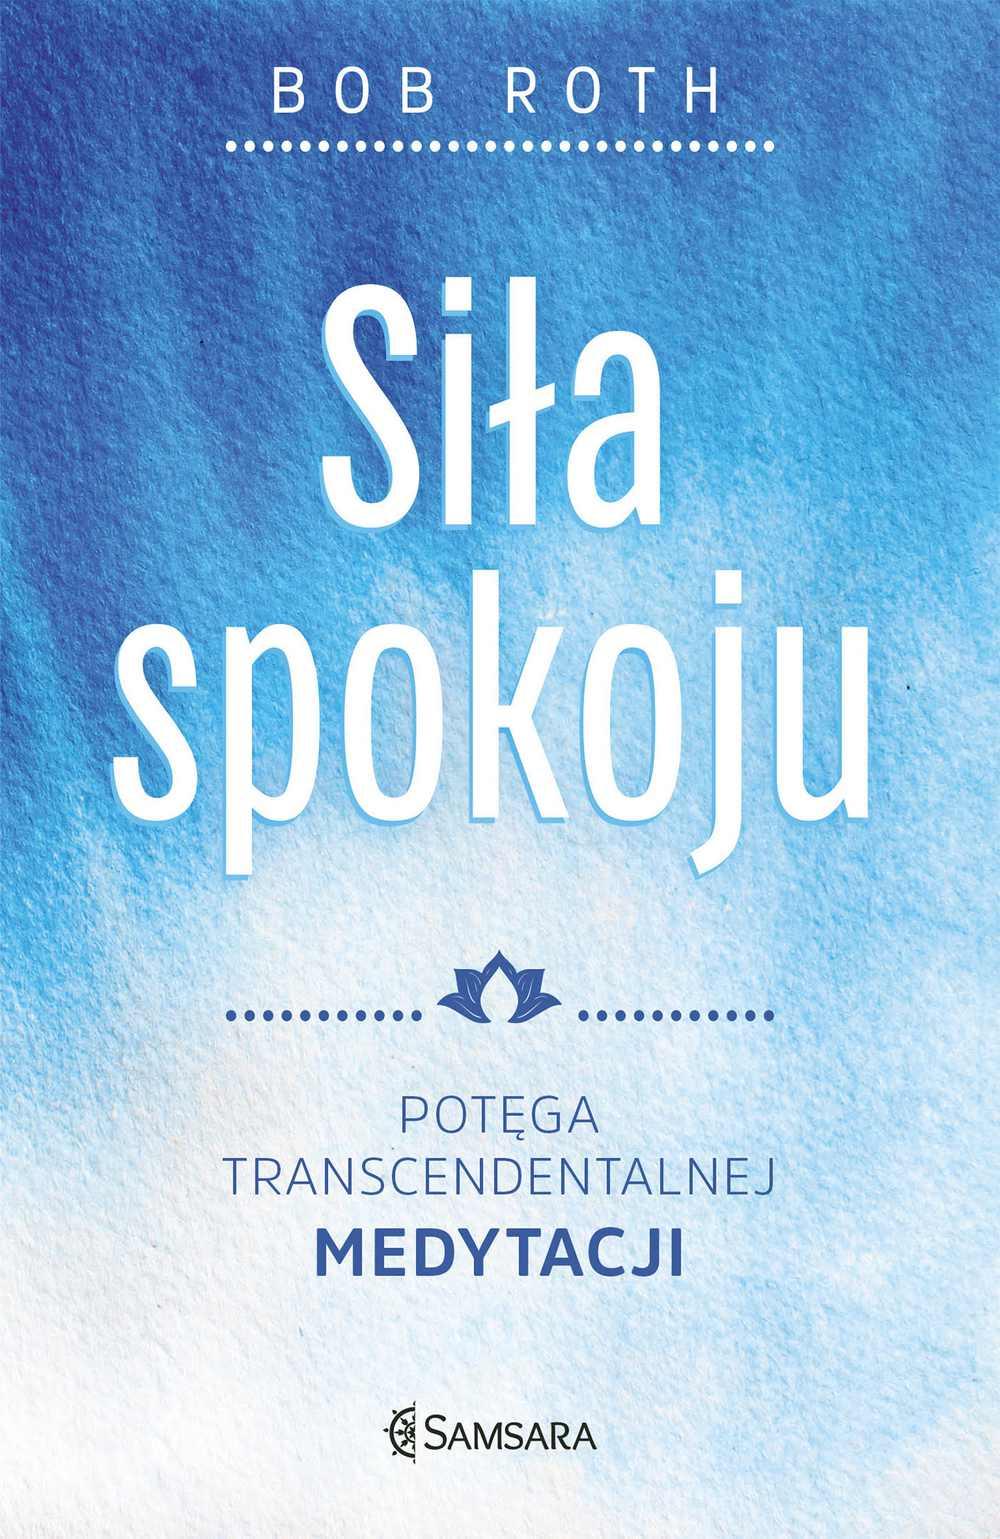 Siła spokoju. Potęga Transcendentalnej Medytacji - Ebook (Książka na Kindle) do pobrania w formacie MOBI